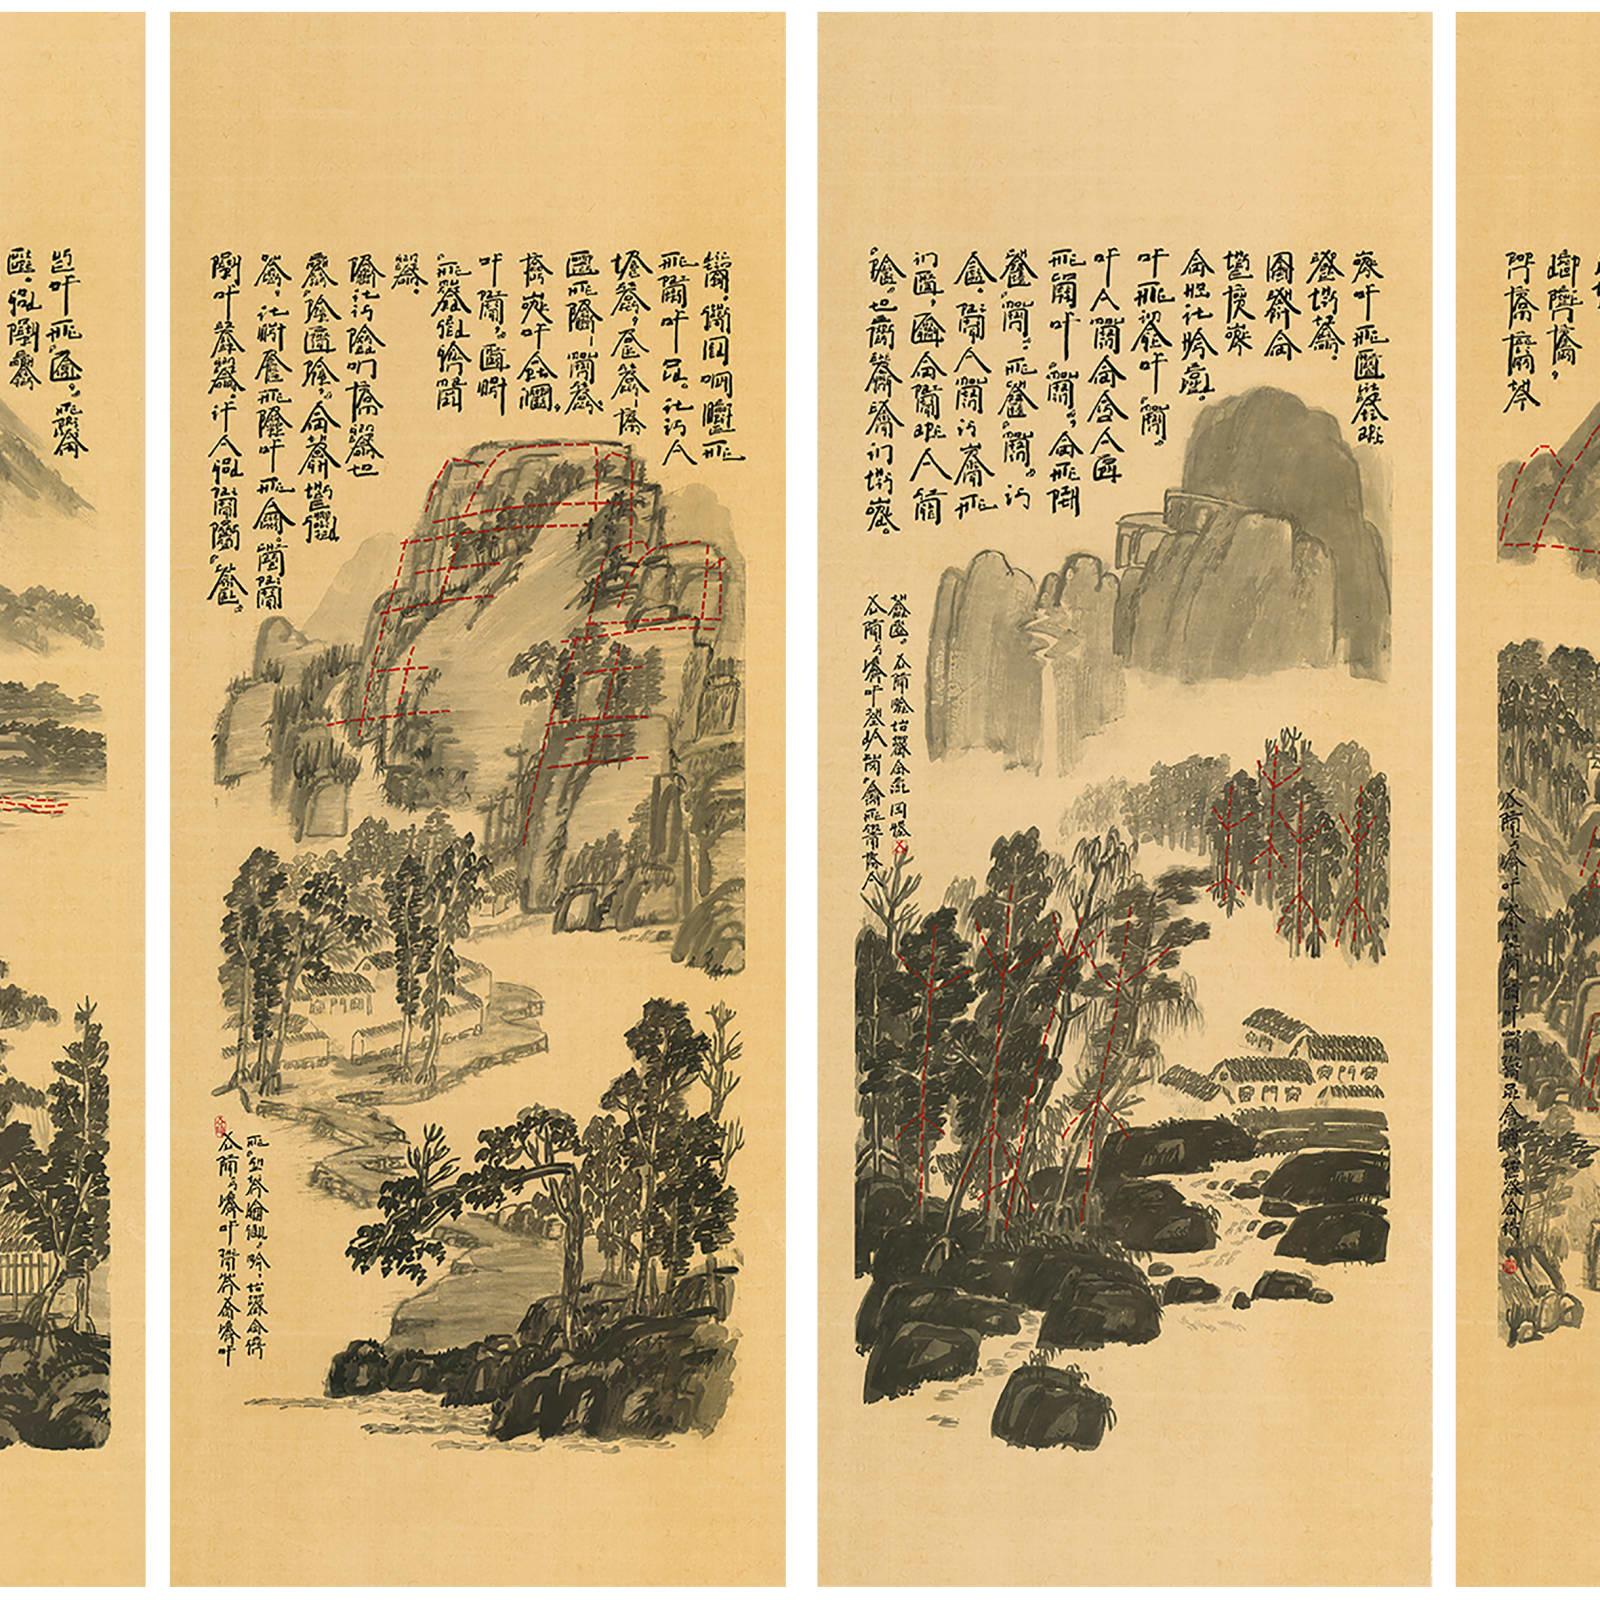 Xu Bing 徐冰, Suzhou Landscripts 苏州文字写生, 2003-2013